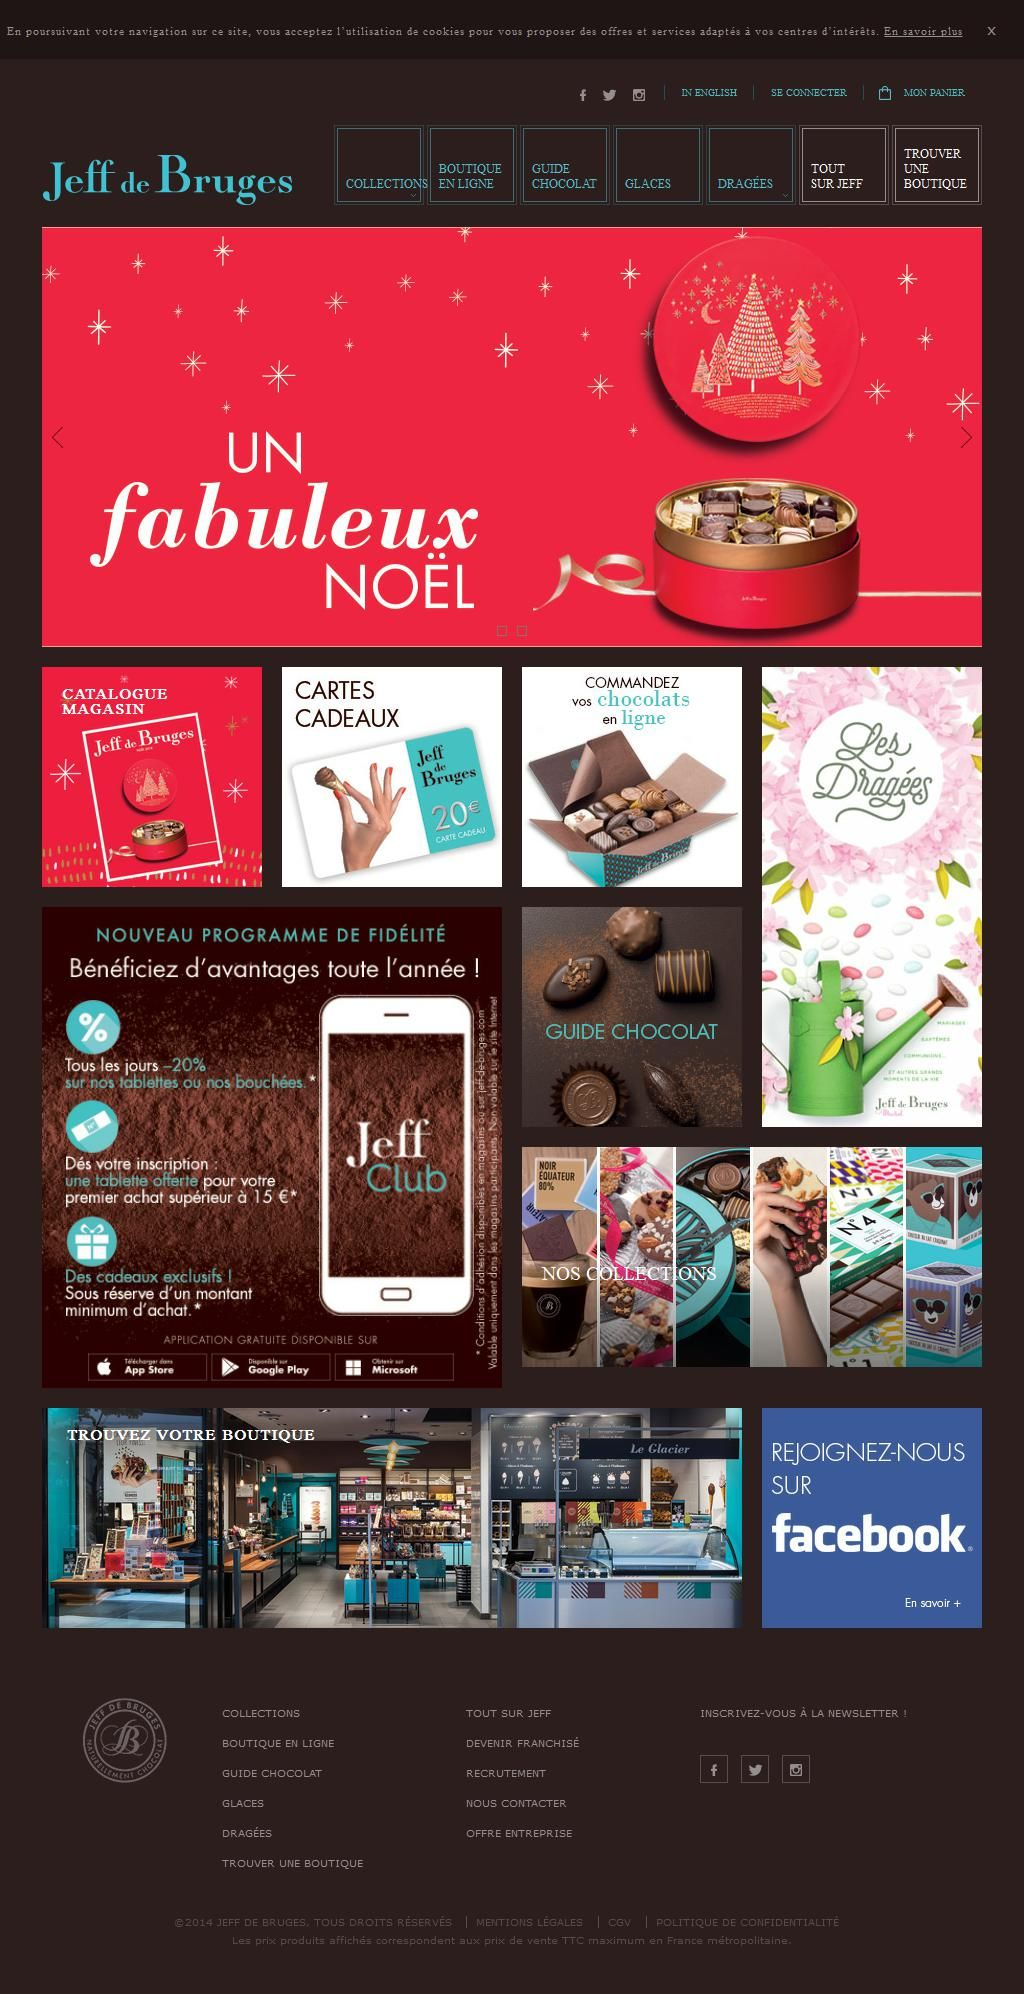 Carte Cadeau Jeff De Bruges.Jeff De Bruges Chocolate Shop Deira City Centre 1b 30 Street 2